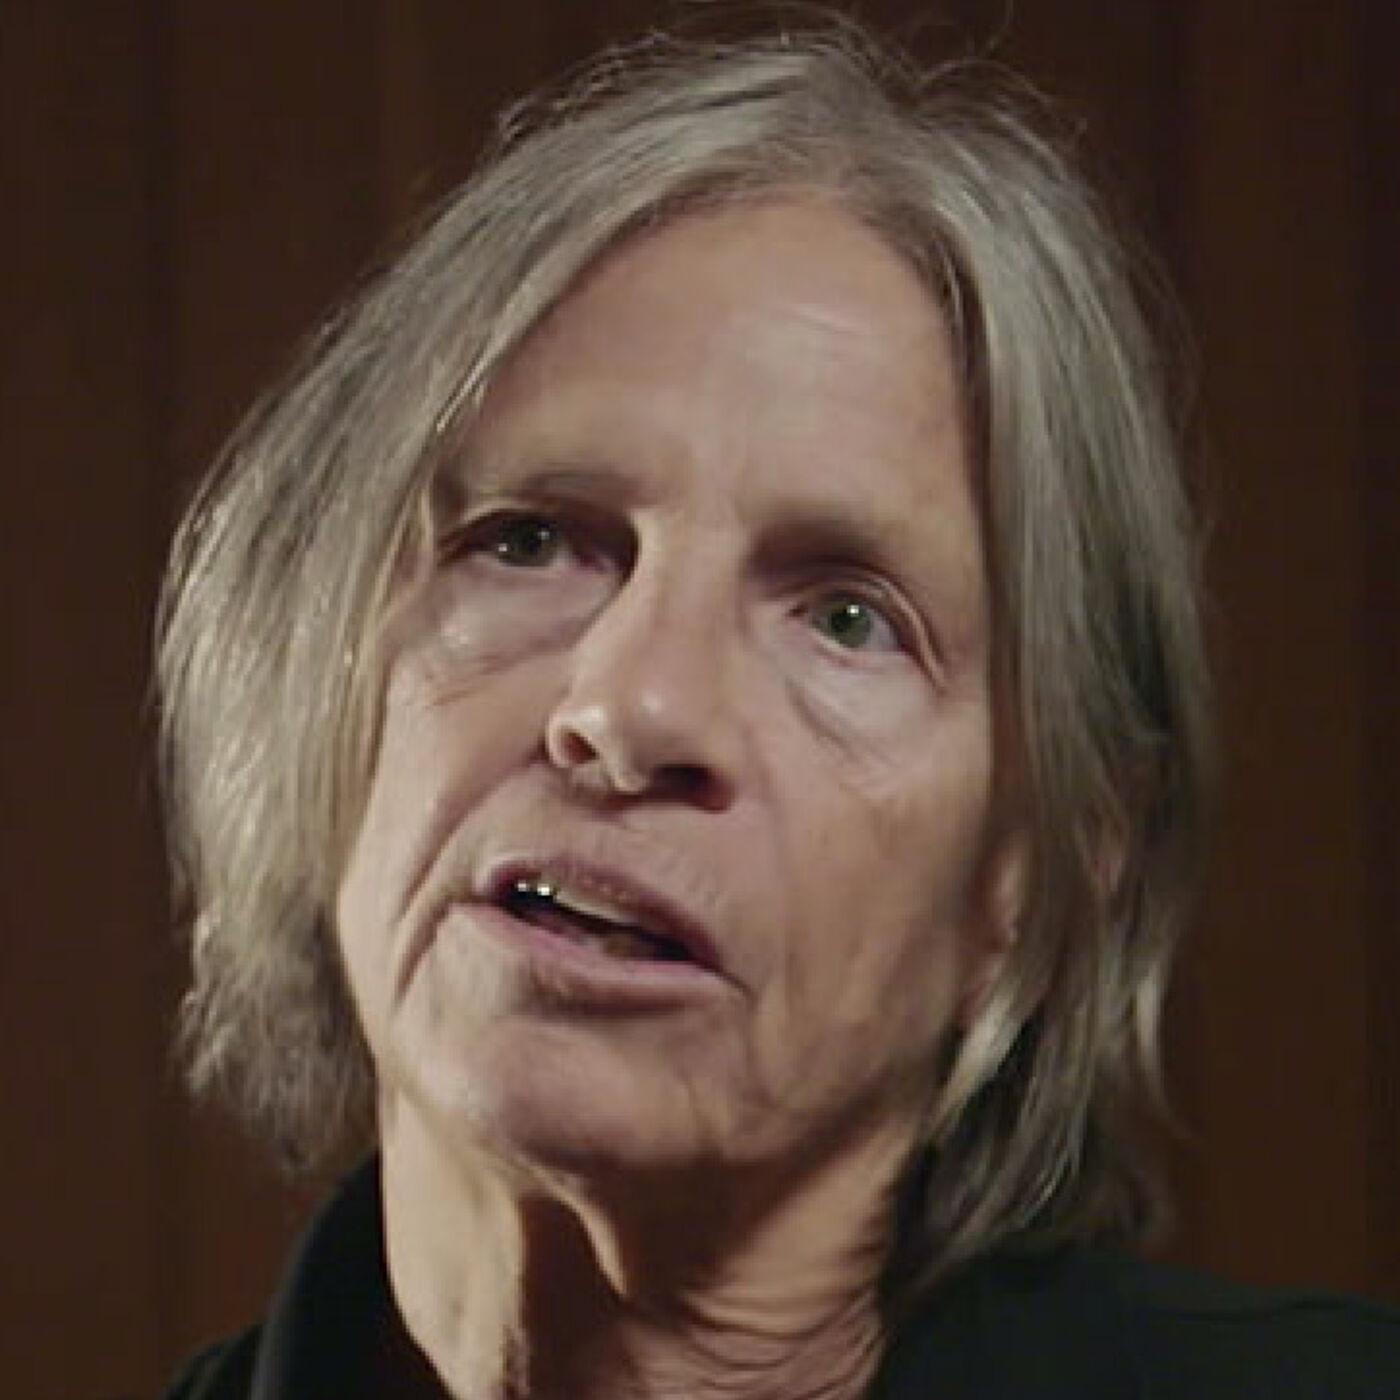 Eileen Myles: A Poem Says 'I Want'